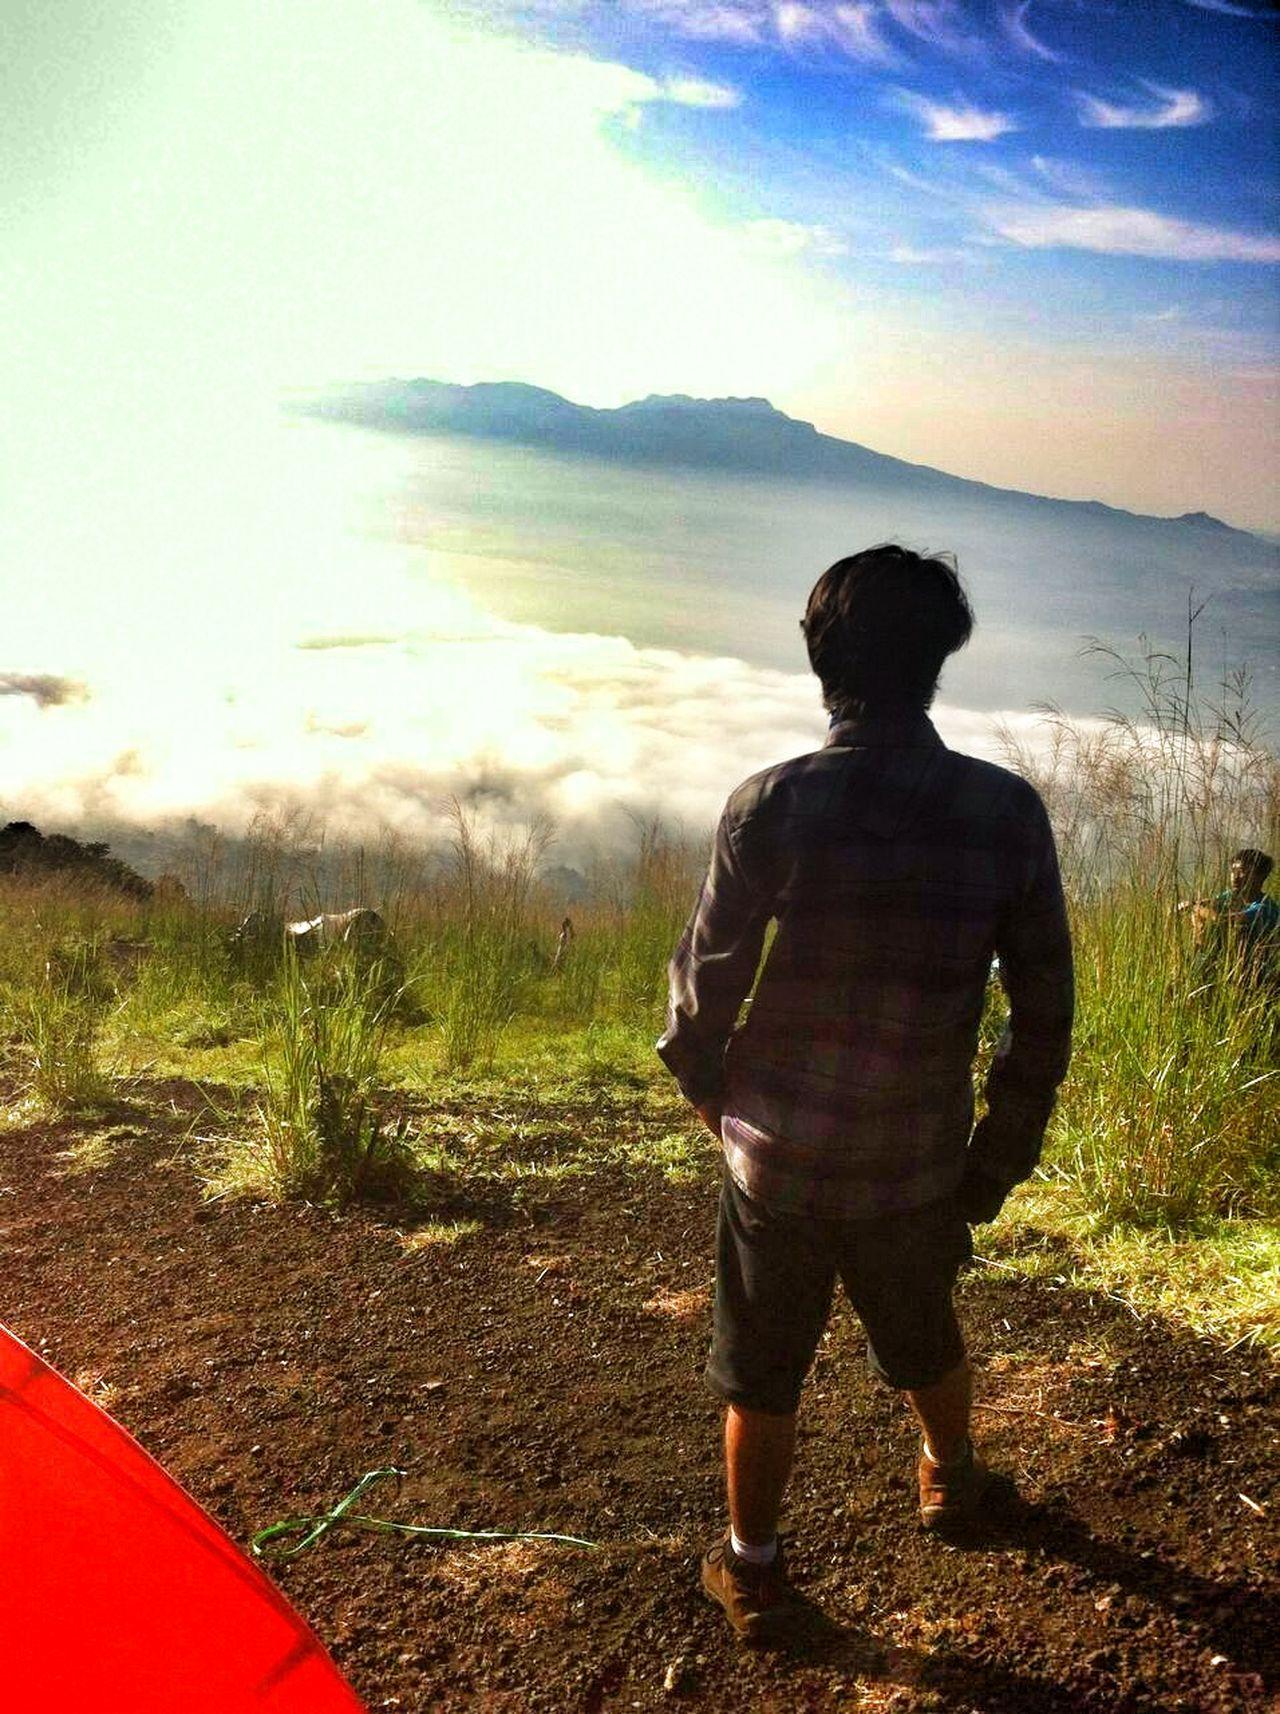 Mt.guntur ,garut west java,indonesia Taking Photos That's Me Enjoying Life Mendaki Paguci Guntur LOL